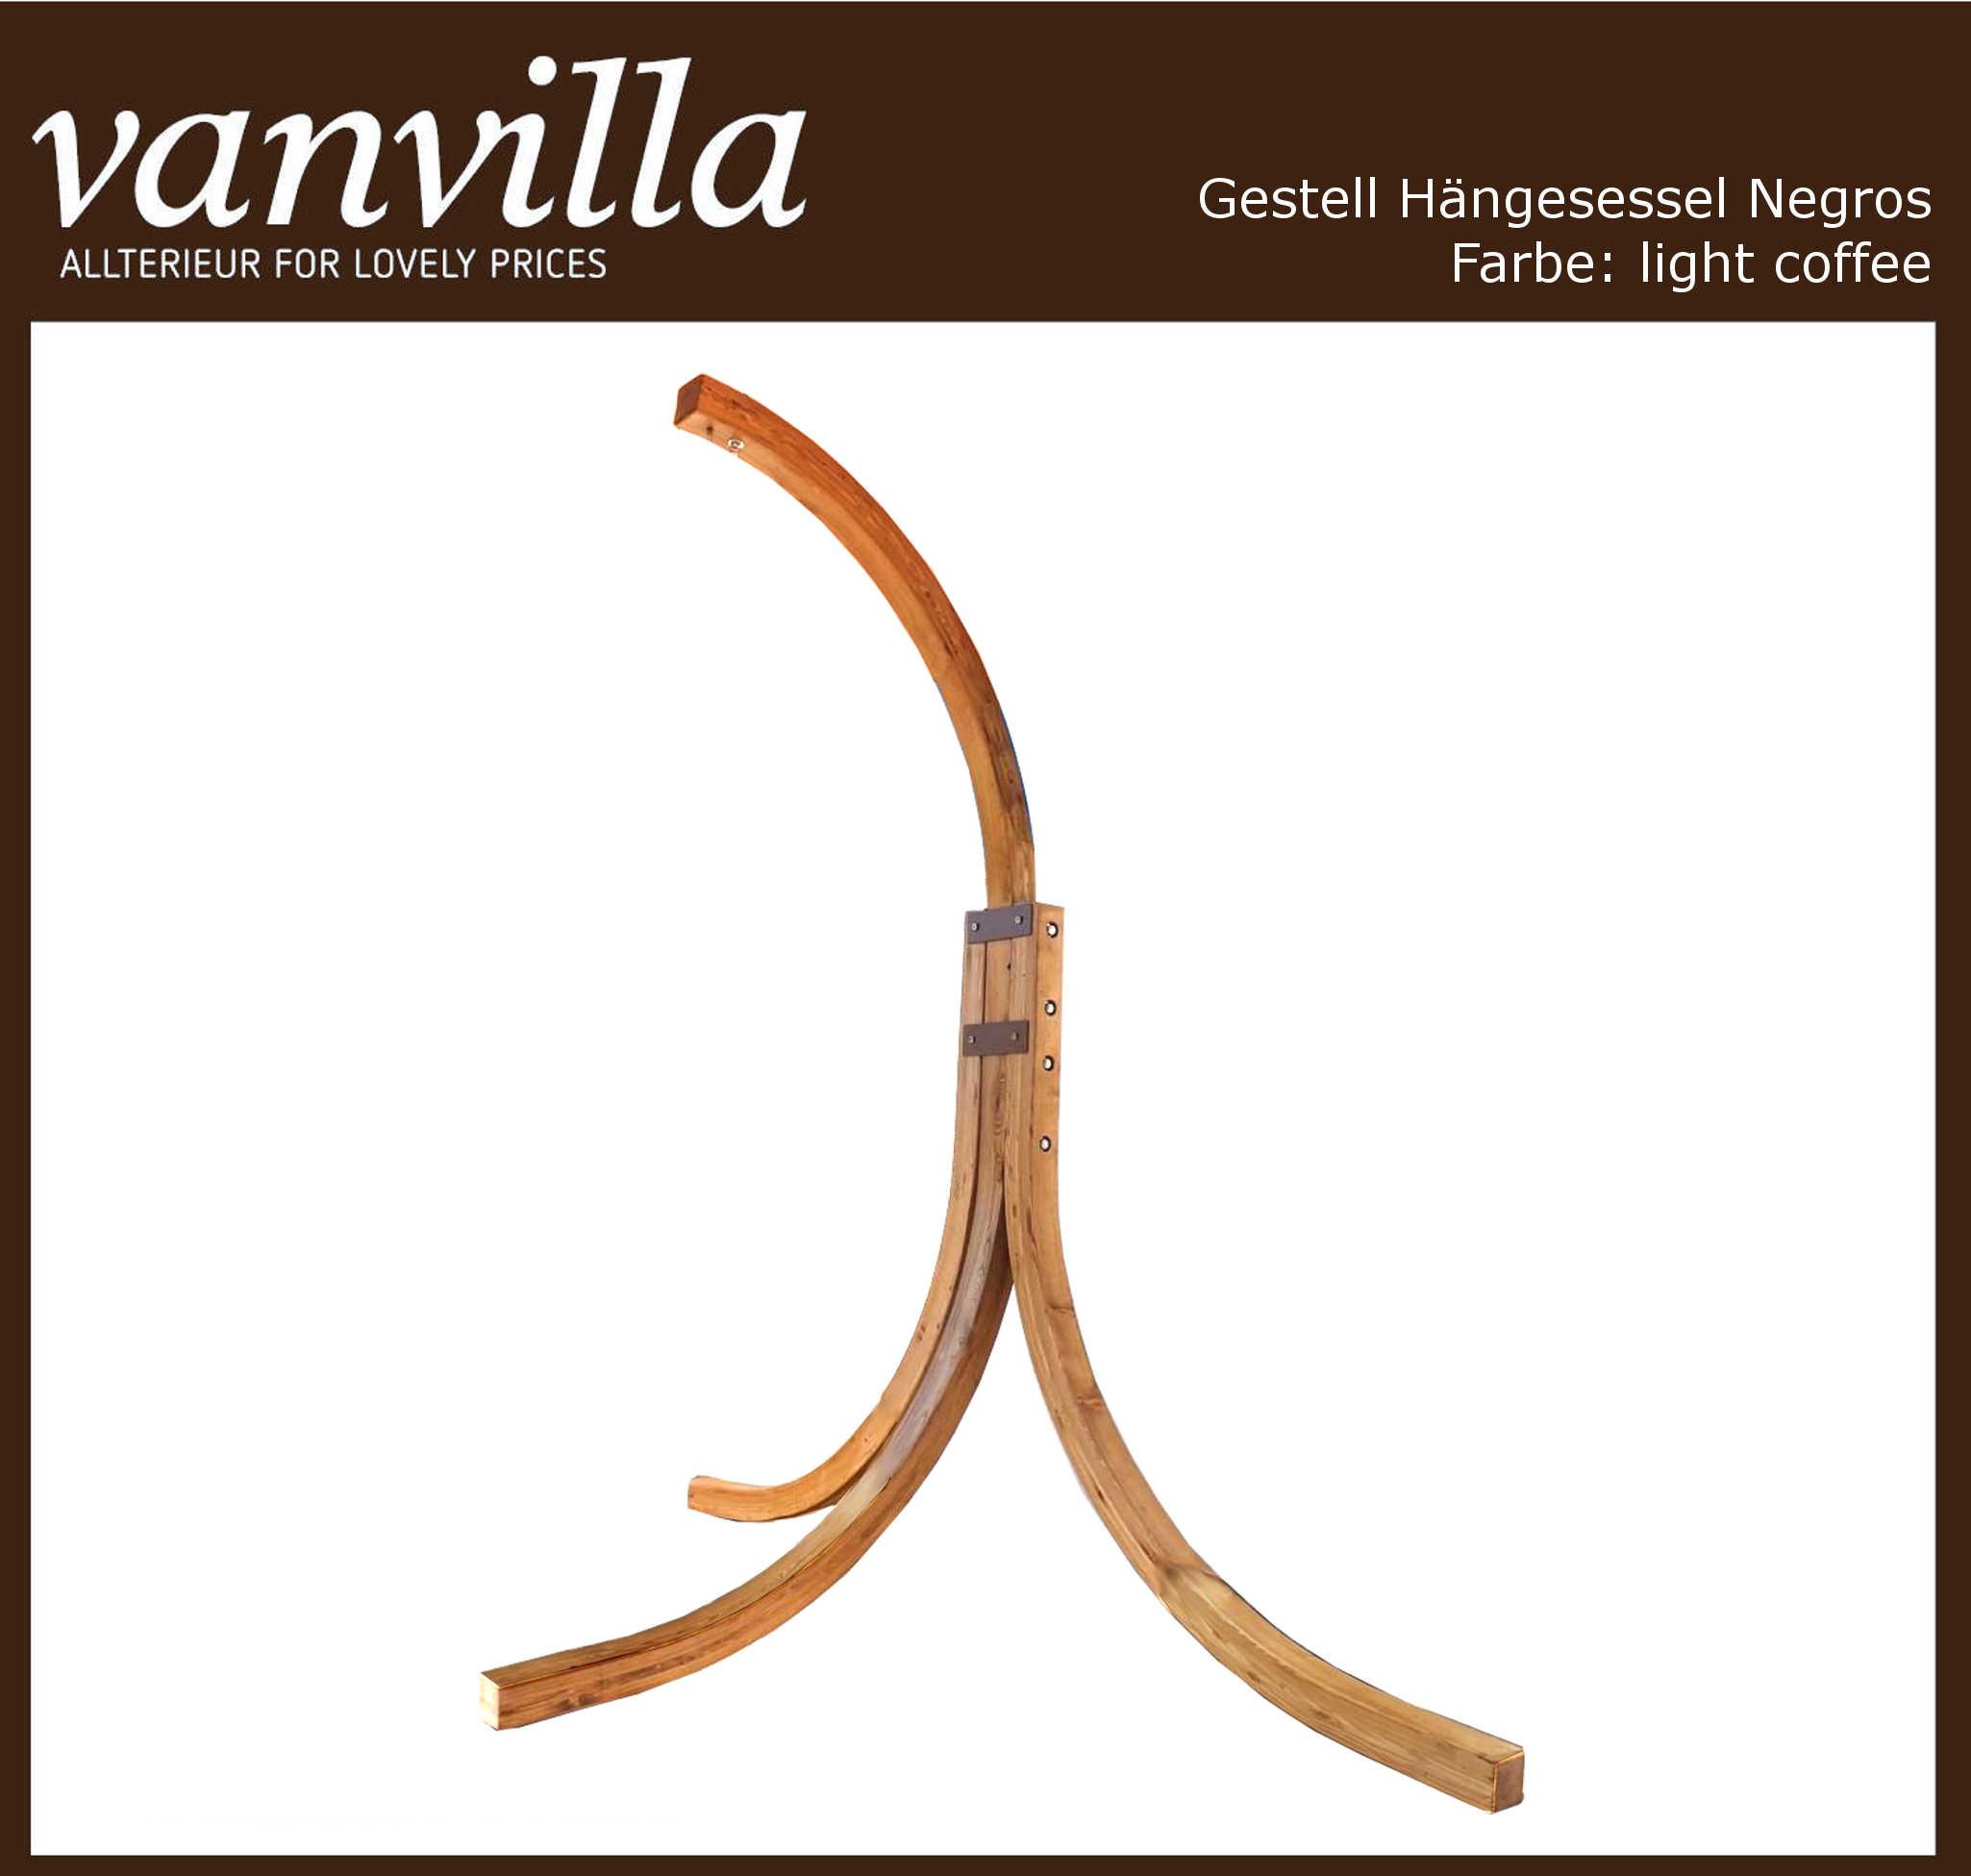 vanvilla Gestell für Hängesessel Modell NEGROS